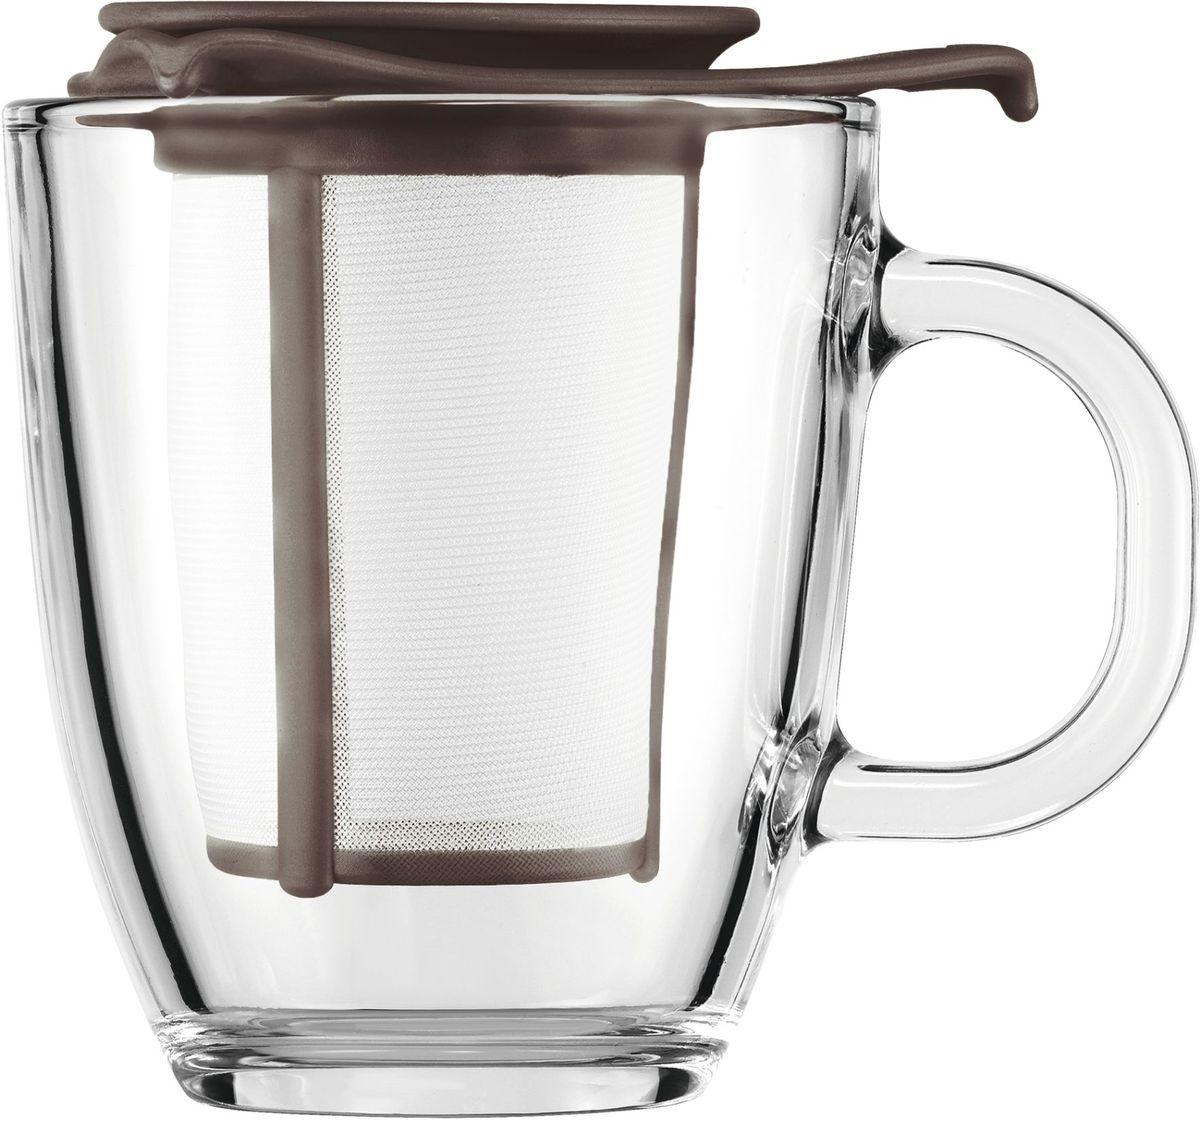 Набор кружка с фильтром Bodum YO-YO, цвет: коричневый. AK11239-618-Y16AK11239-618-Y16